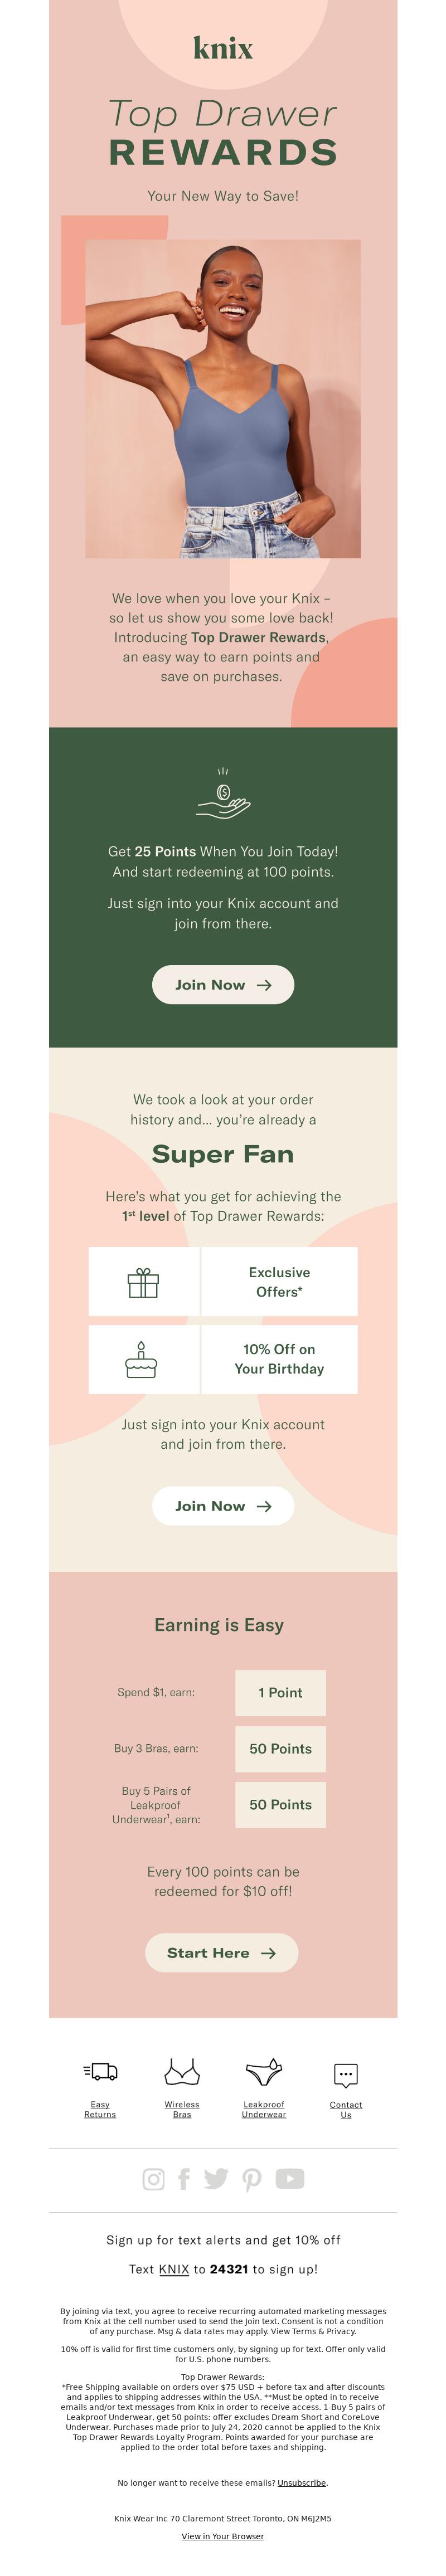 Knix - Introducing Top Drawer Rewards!